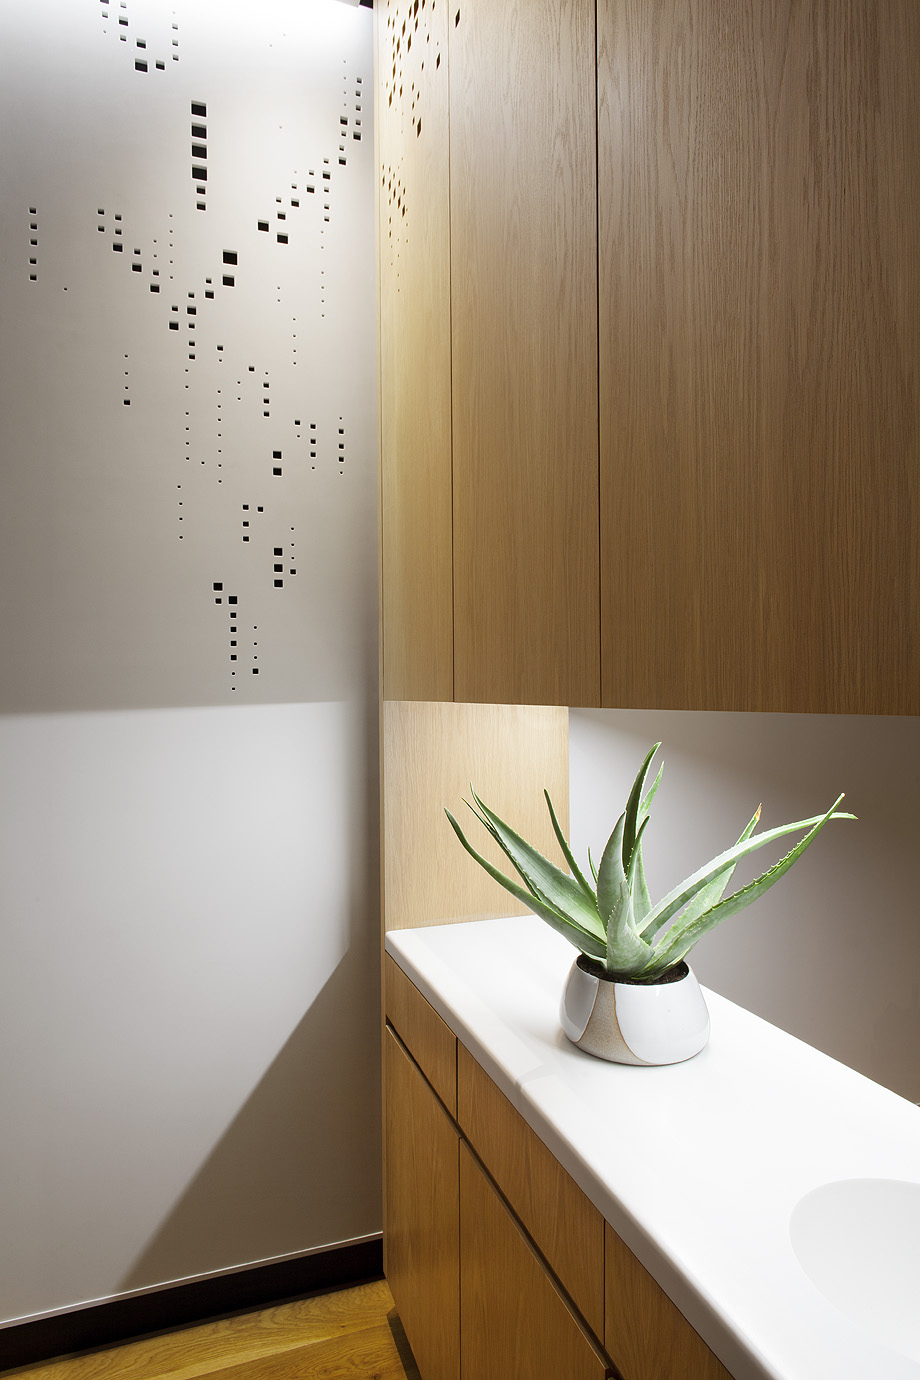 studio dental mdu de montalba architects - foto mitch tobias (4)